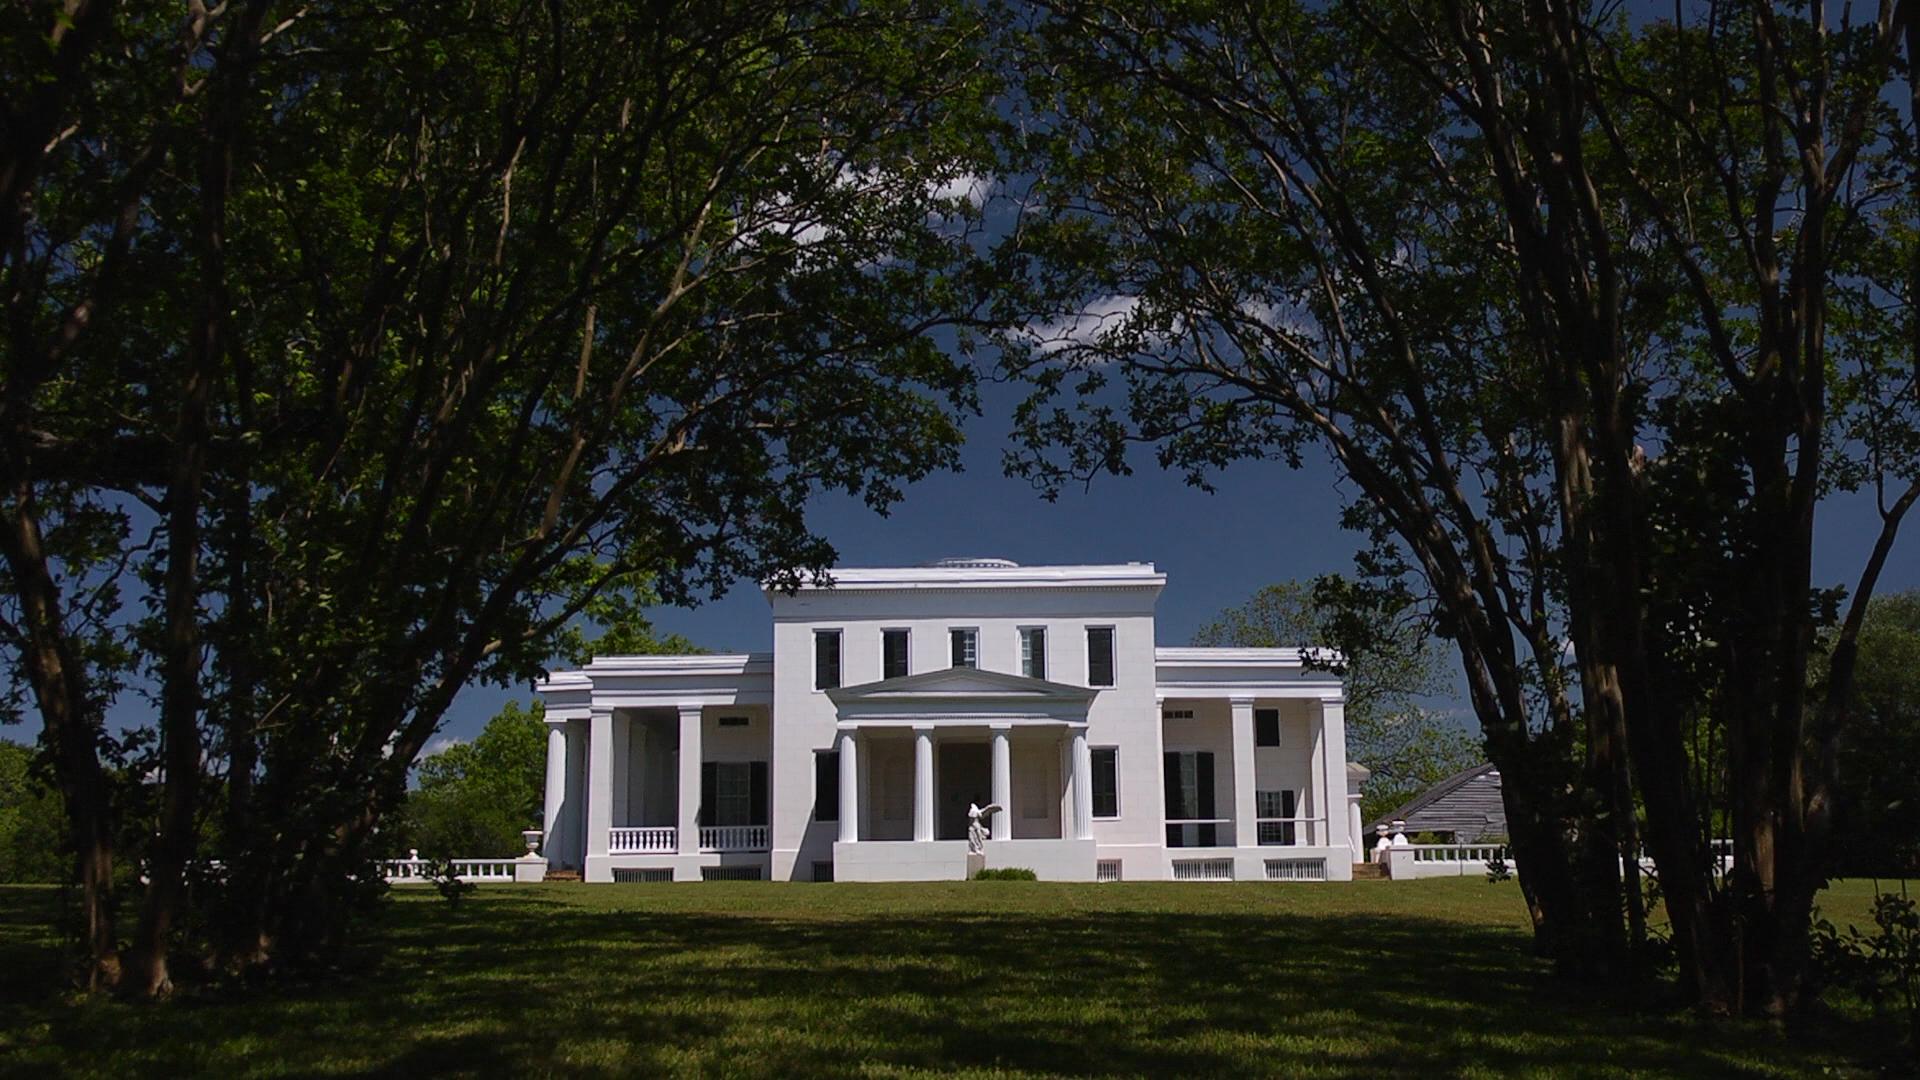 Gaineswood in Demopolis, Alabama